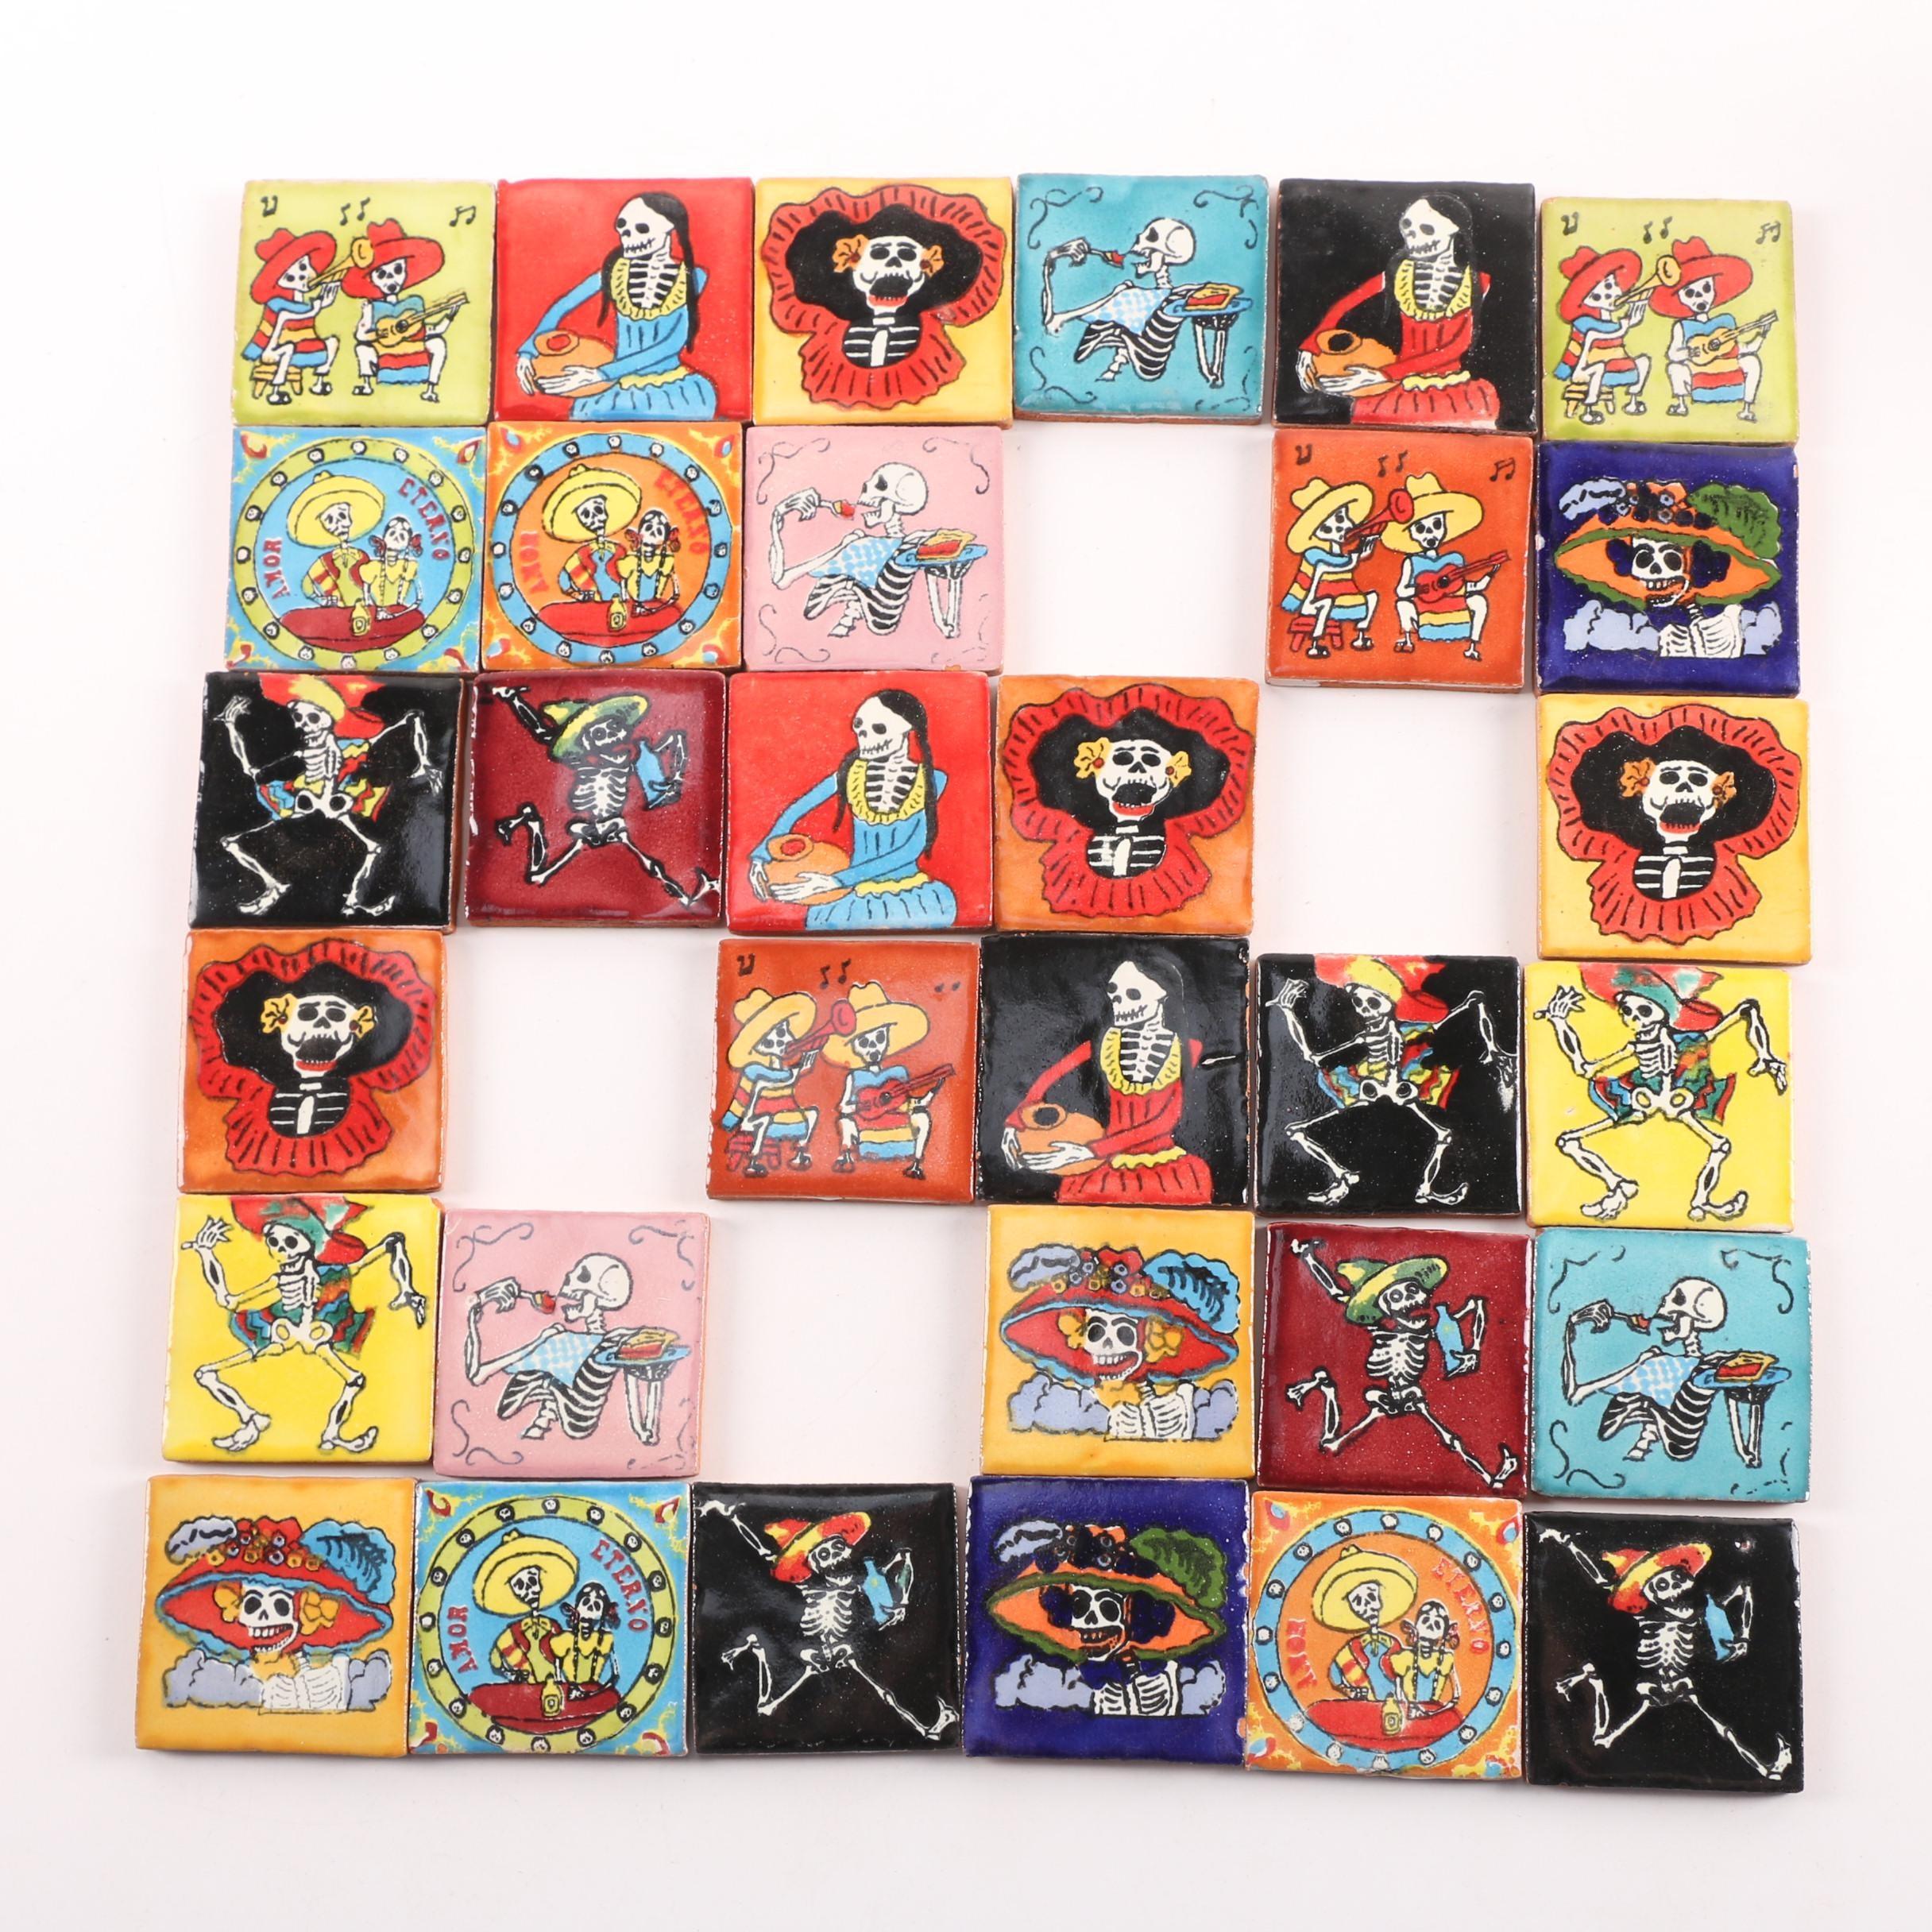 Mexican Day of the Dead Folk Art Style Talavera Tiles